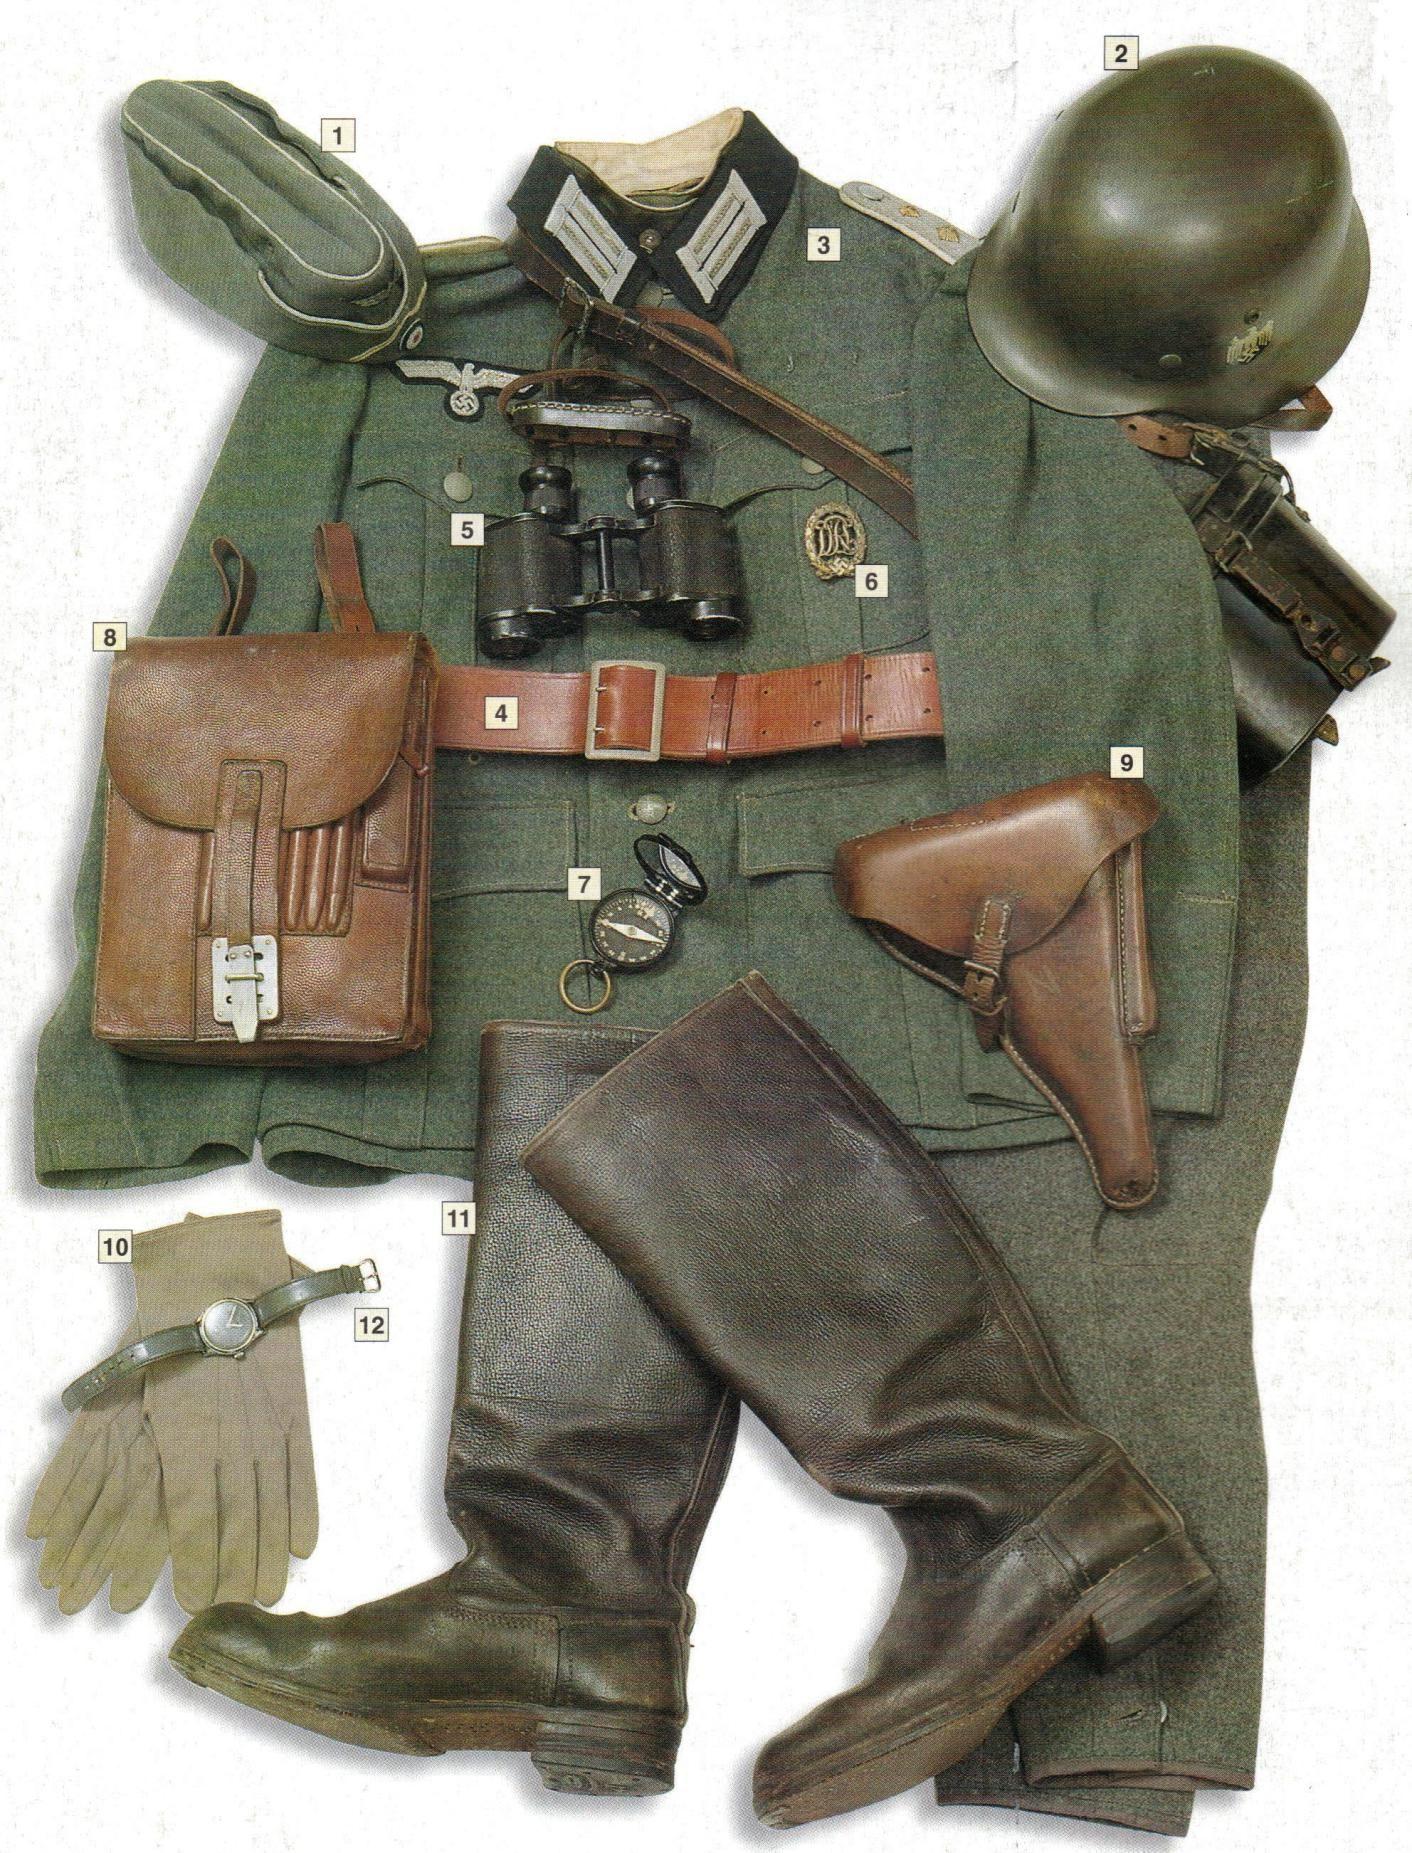 Uniform Guide German Uniforms Wwii German Uniforms Wwii